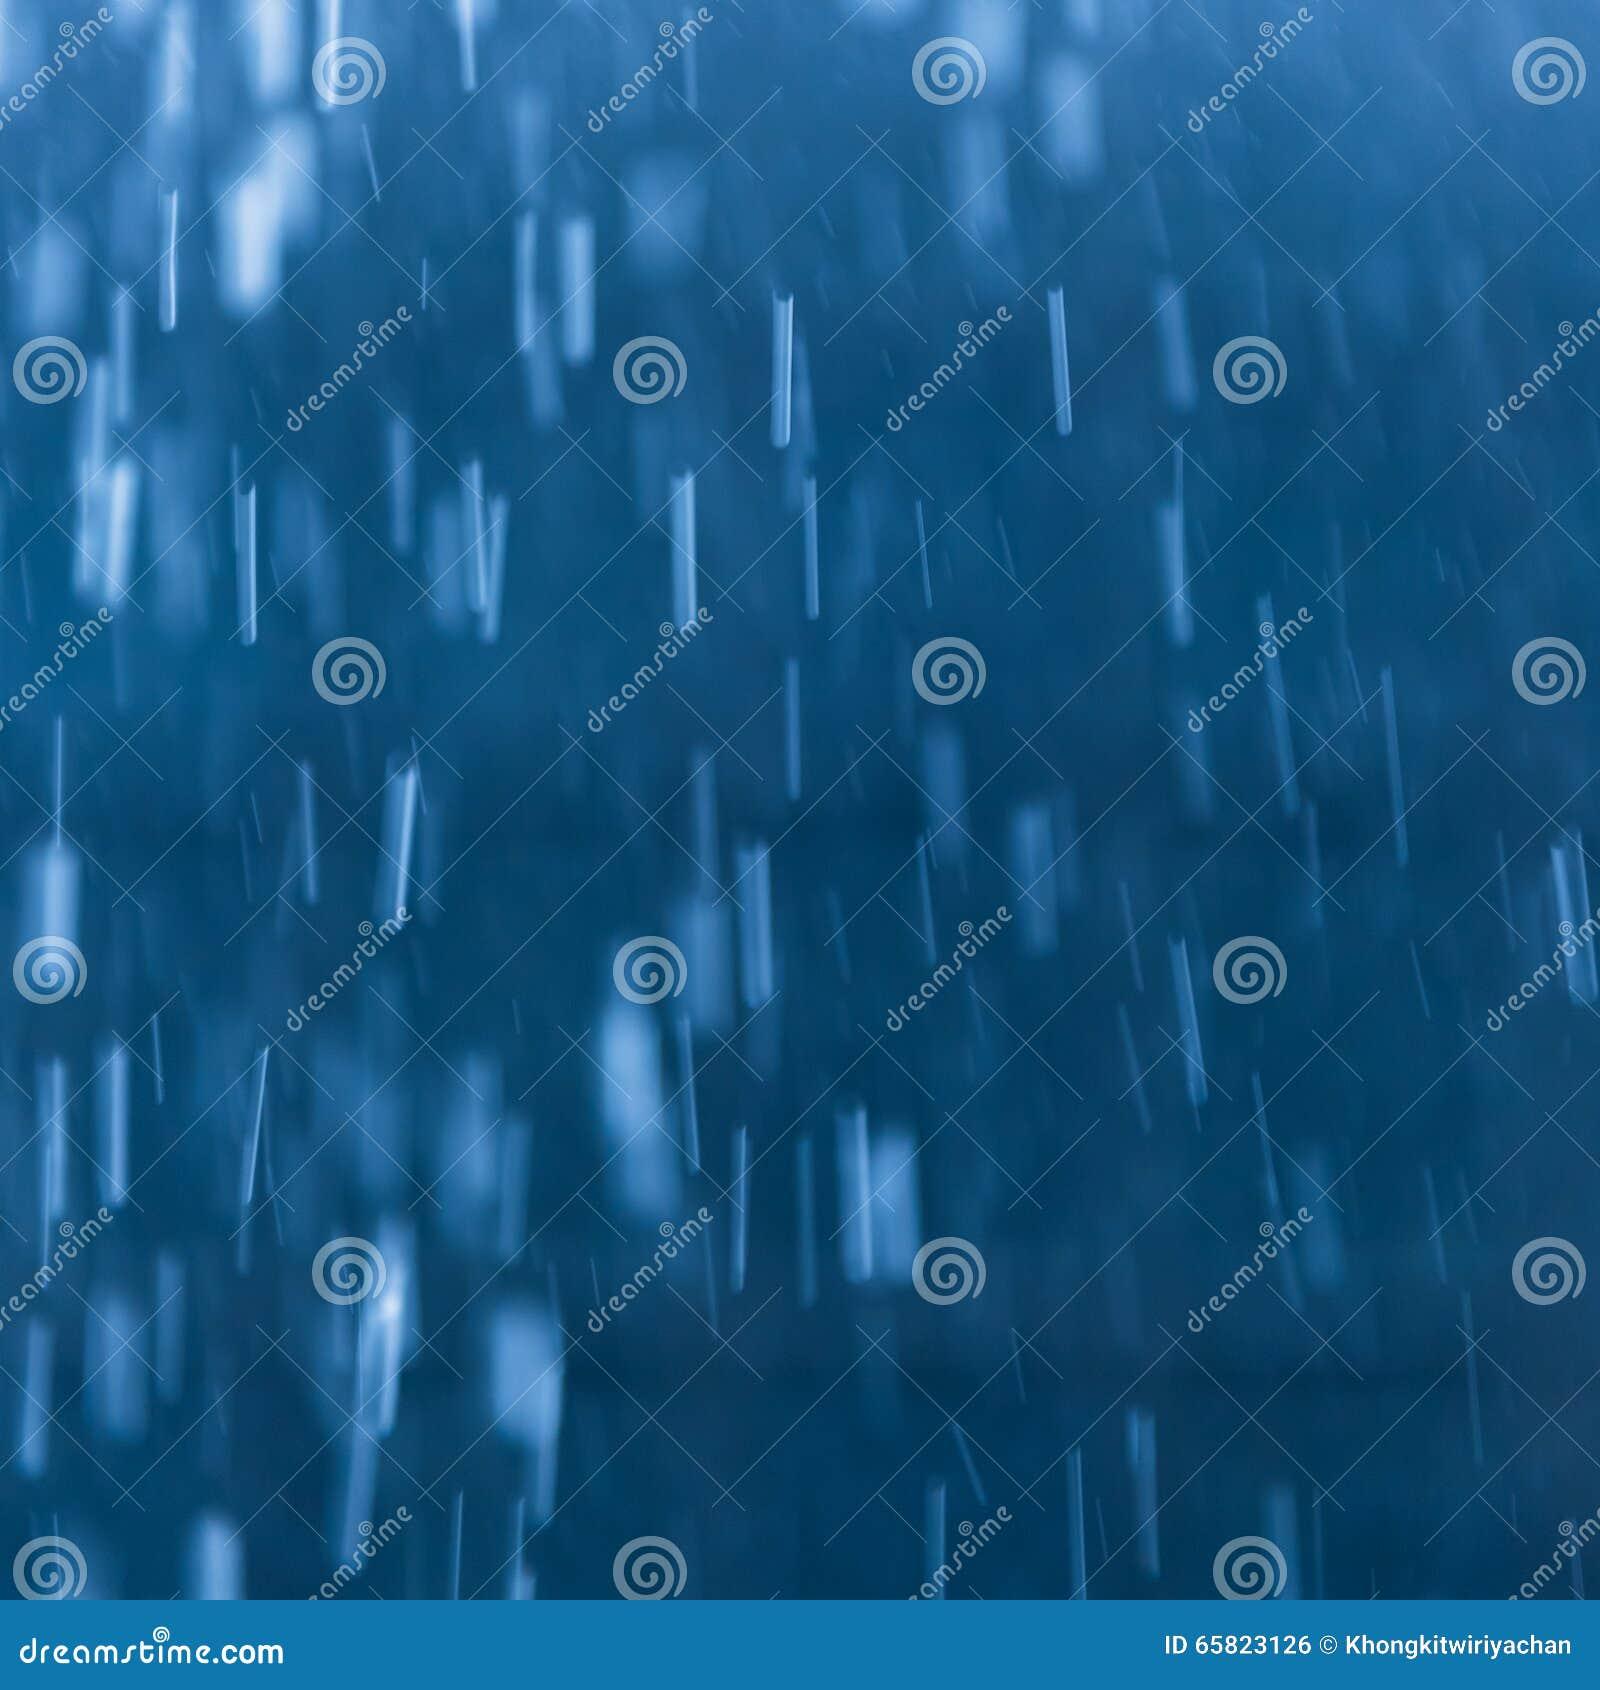 Heavy rain as background image